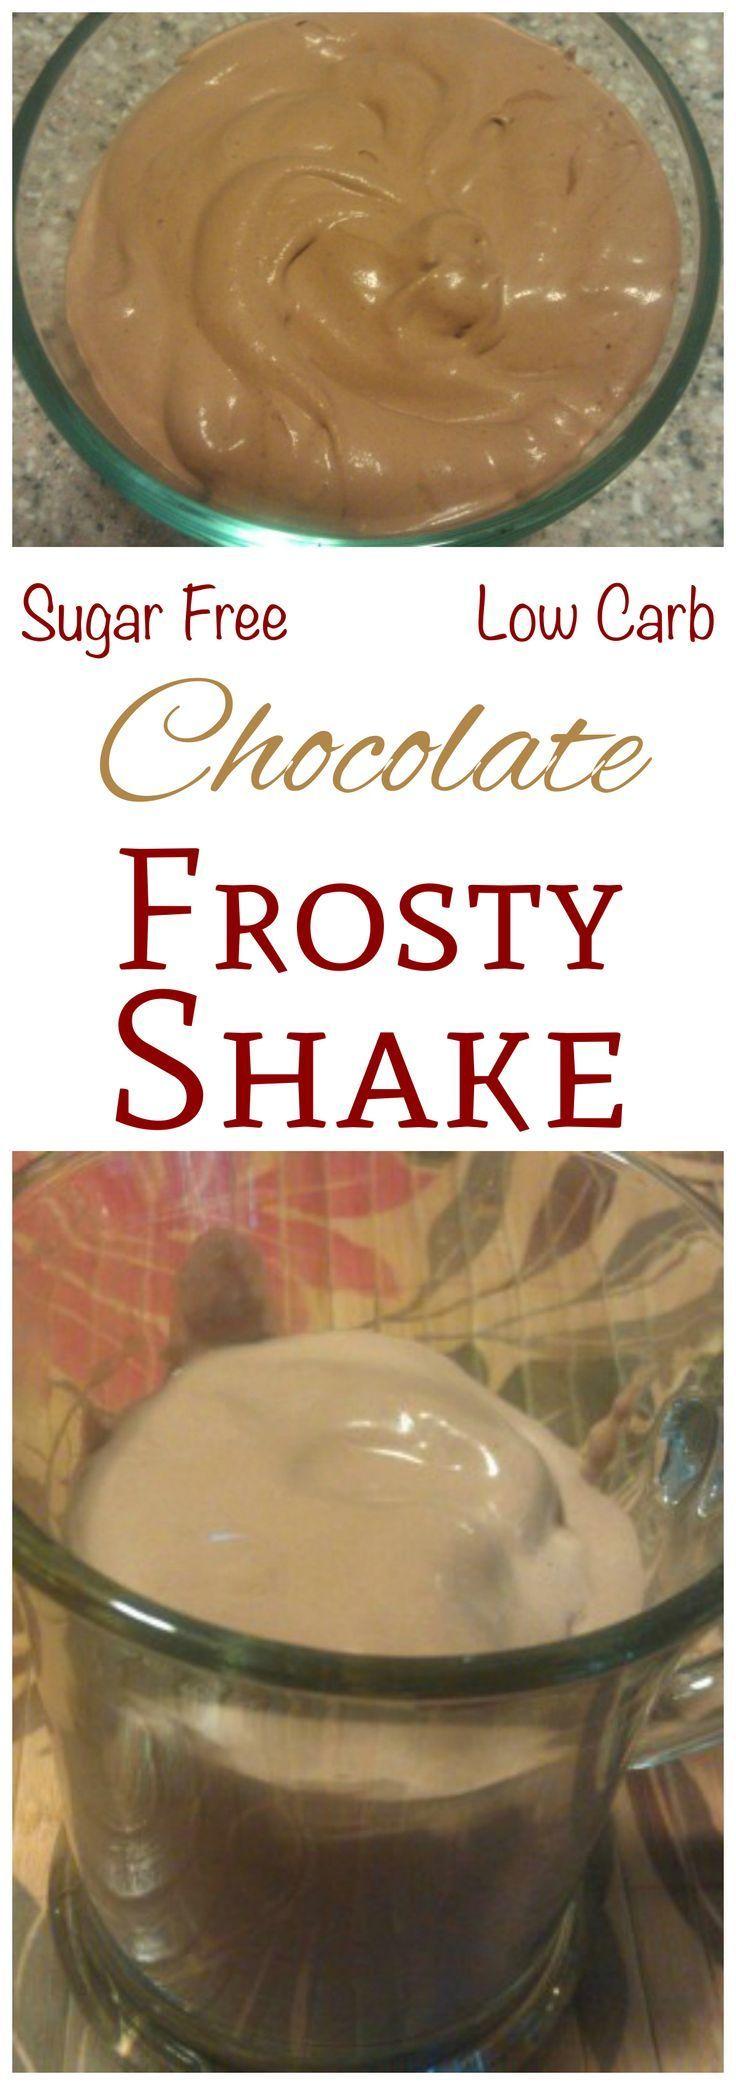 Best 25+ Chocolate frosty ideas on Pinterest | Wendy's chocolate frosty recipe, Wendy's frosty ...